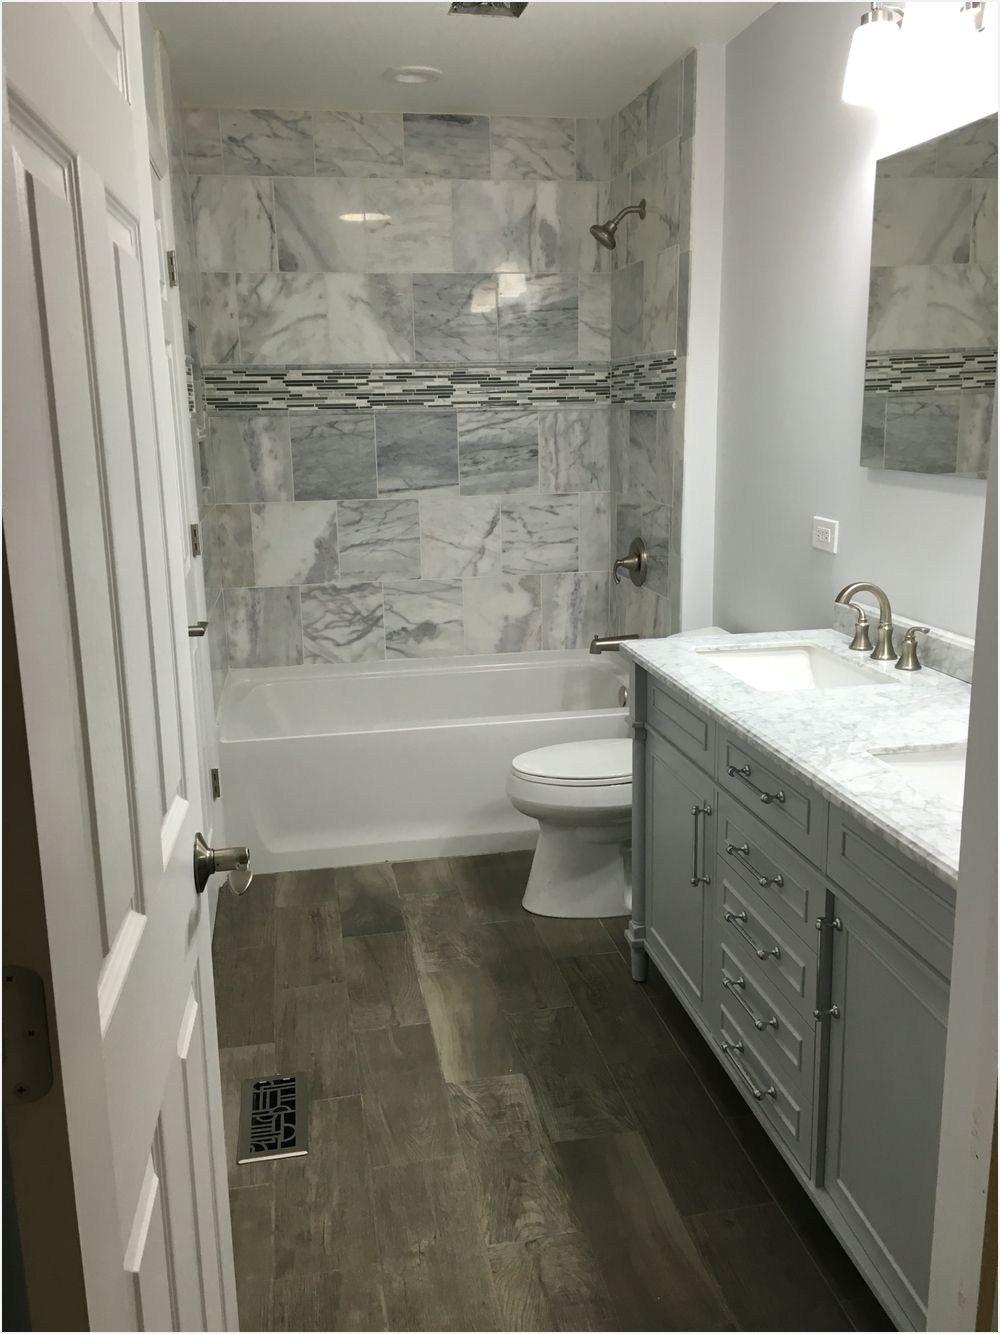 41 Awesome Small Full Bathroom Remodel Ideas Small Full Bathroom